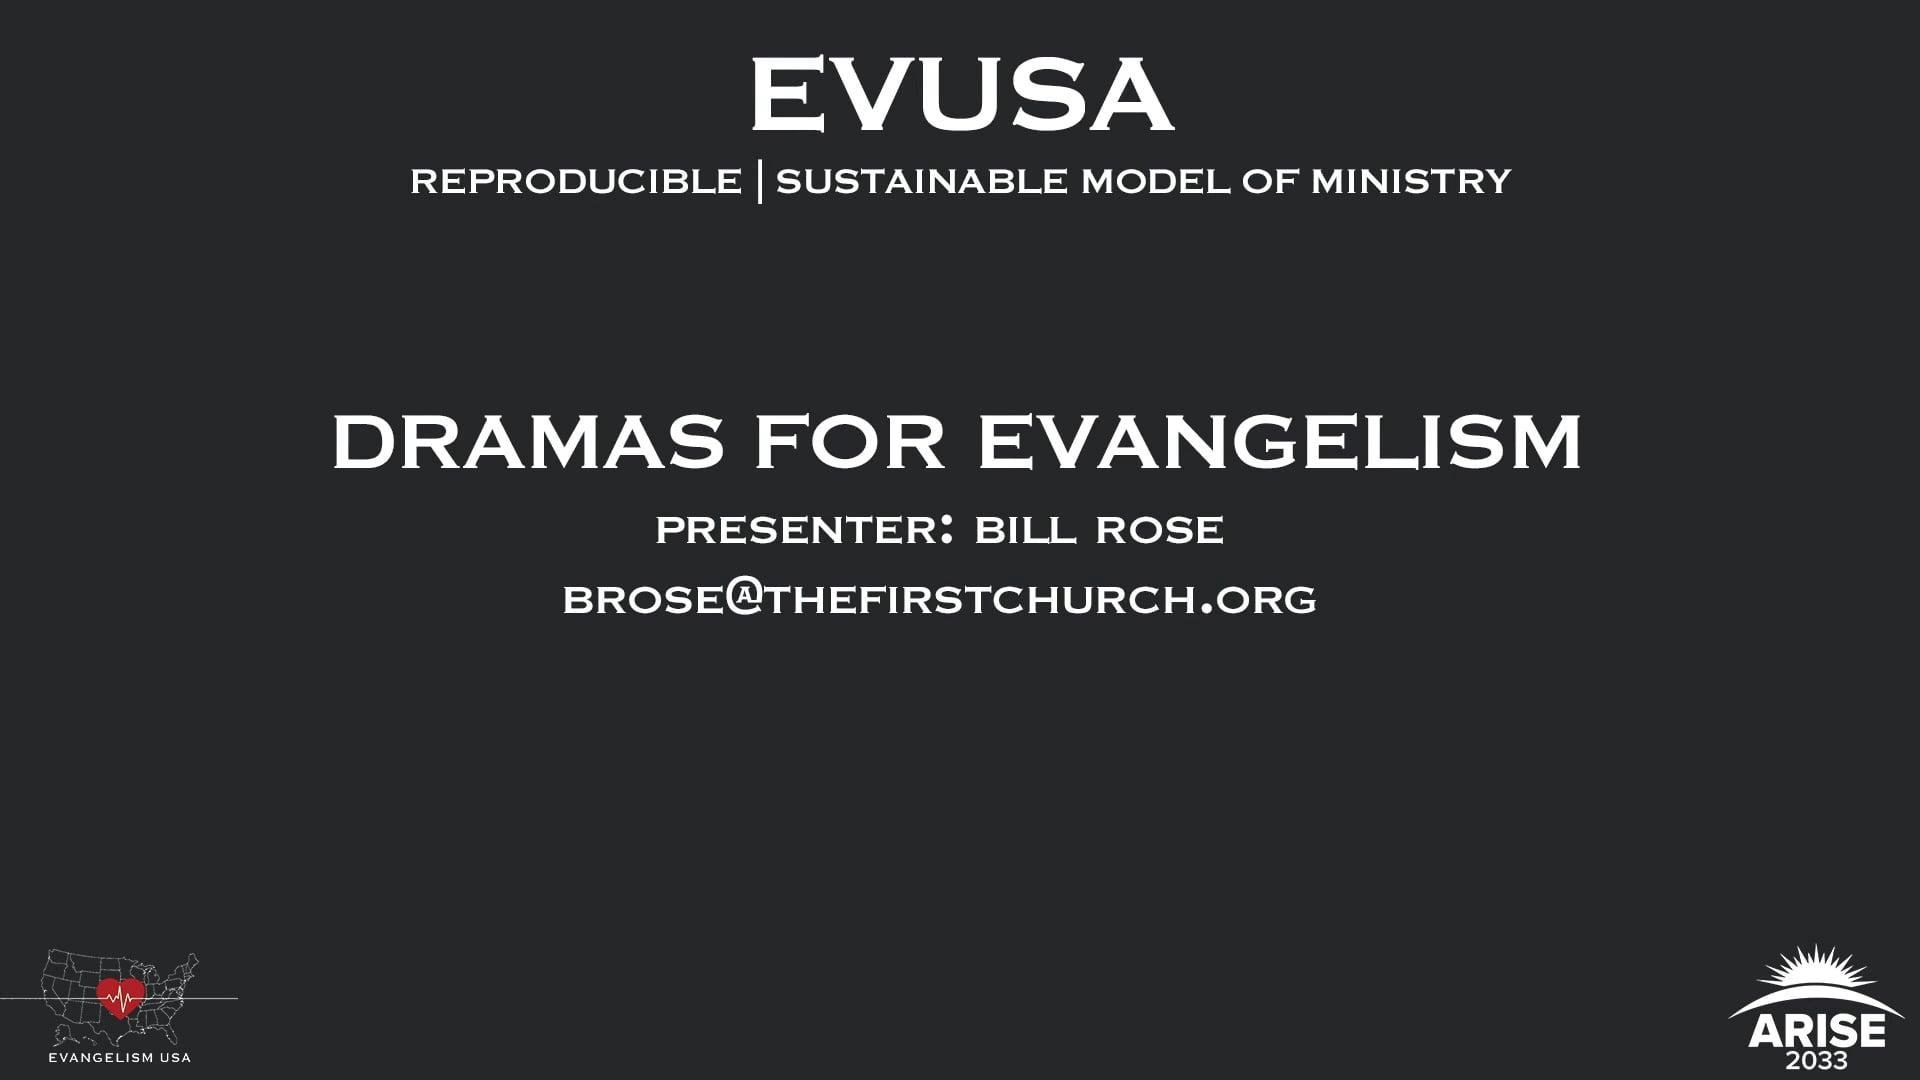 Dramas For Evangelism